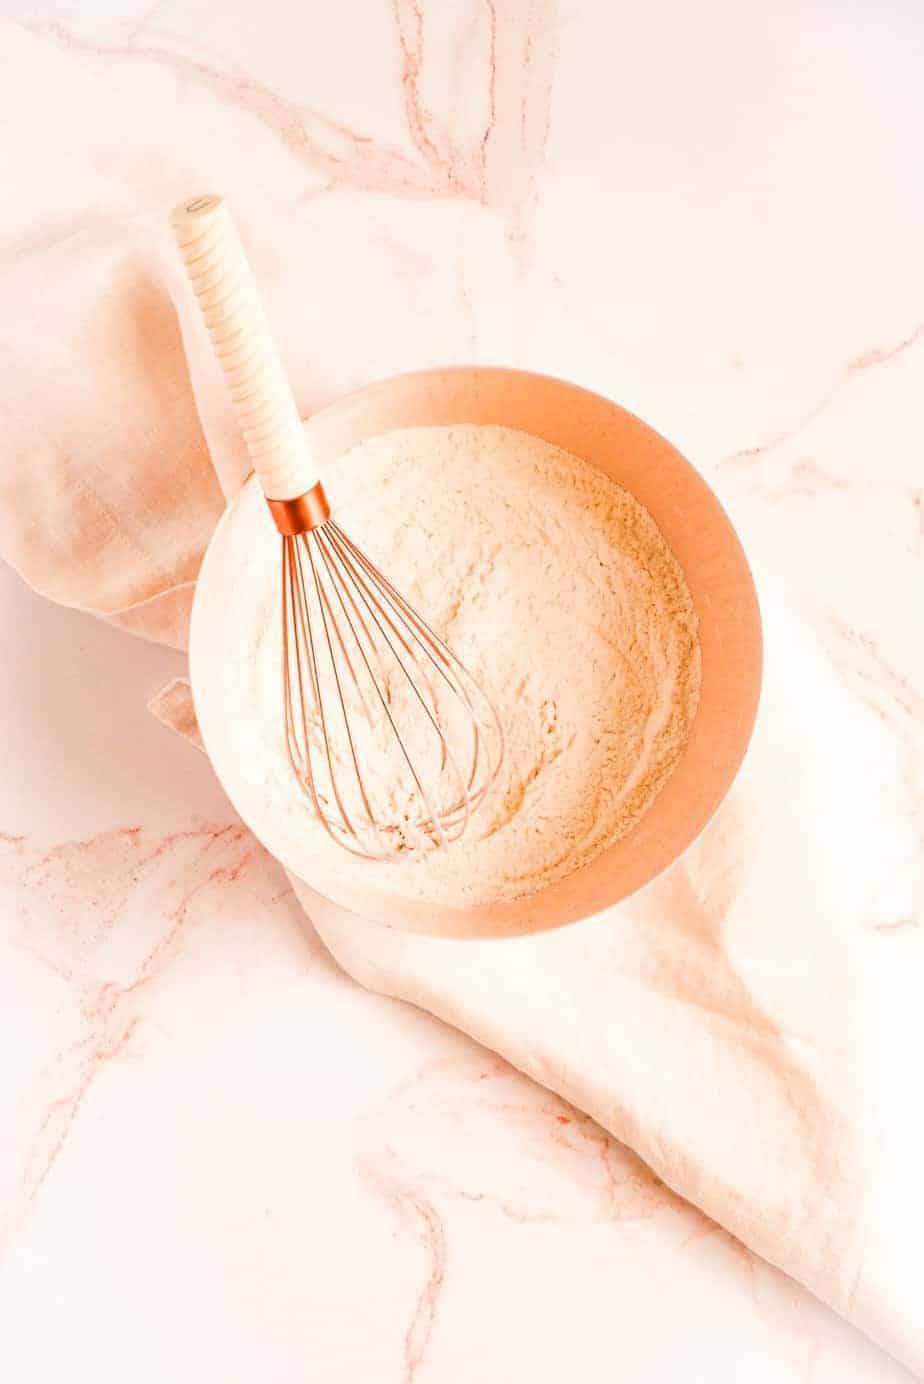 buttermilk pancake dry ingredients in a bowl